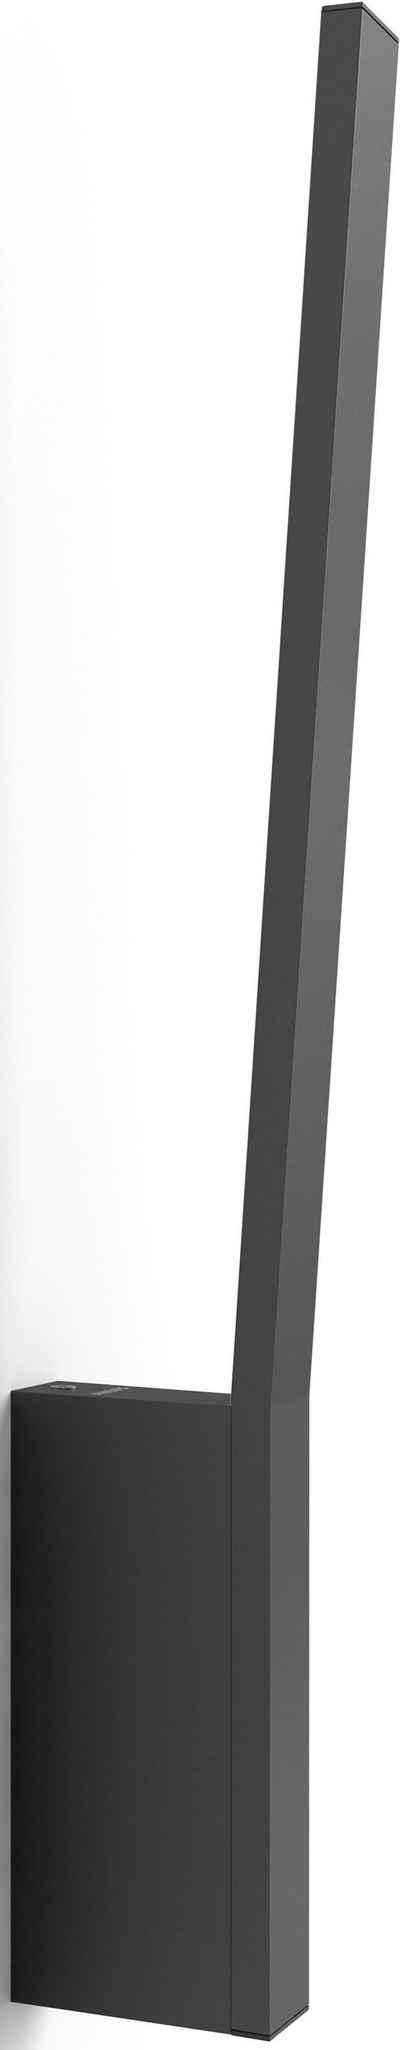 Philips Hue LED Wandleuchte »White & Col. Amb. Liane schwarz 900lm«